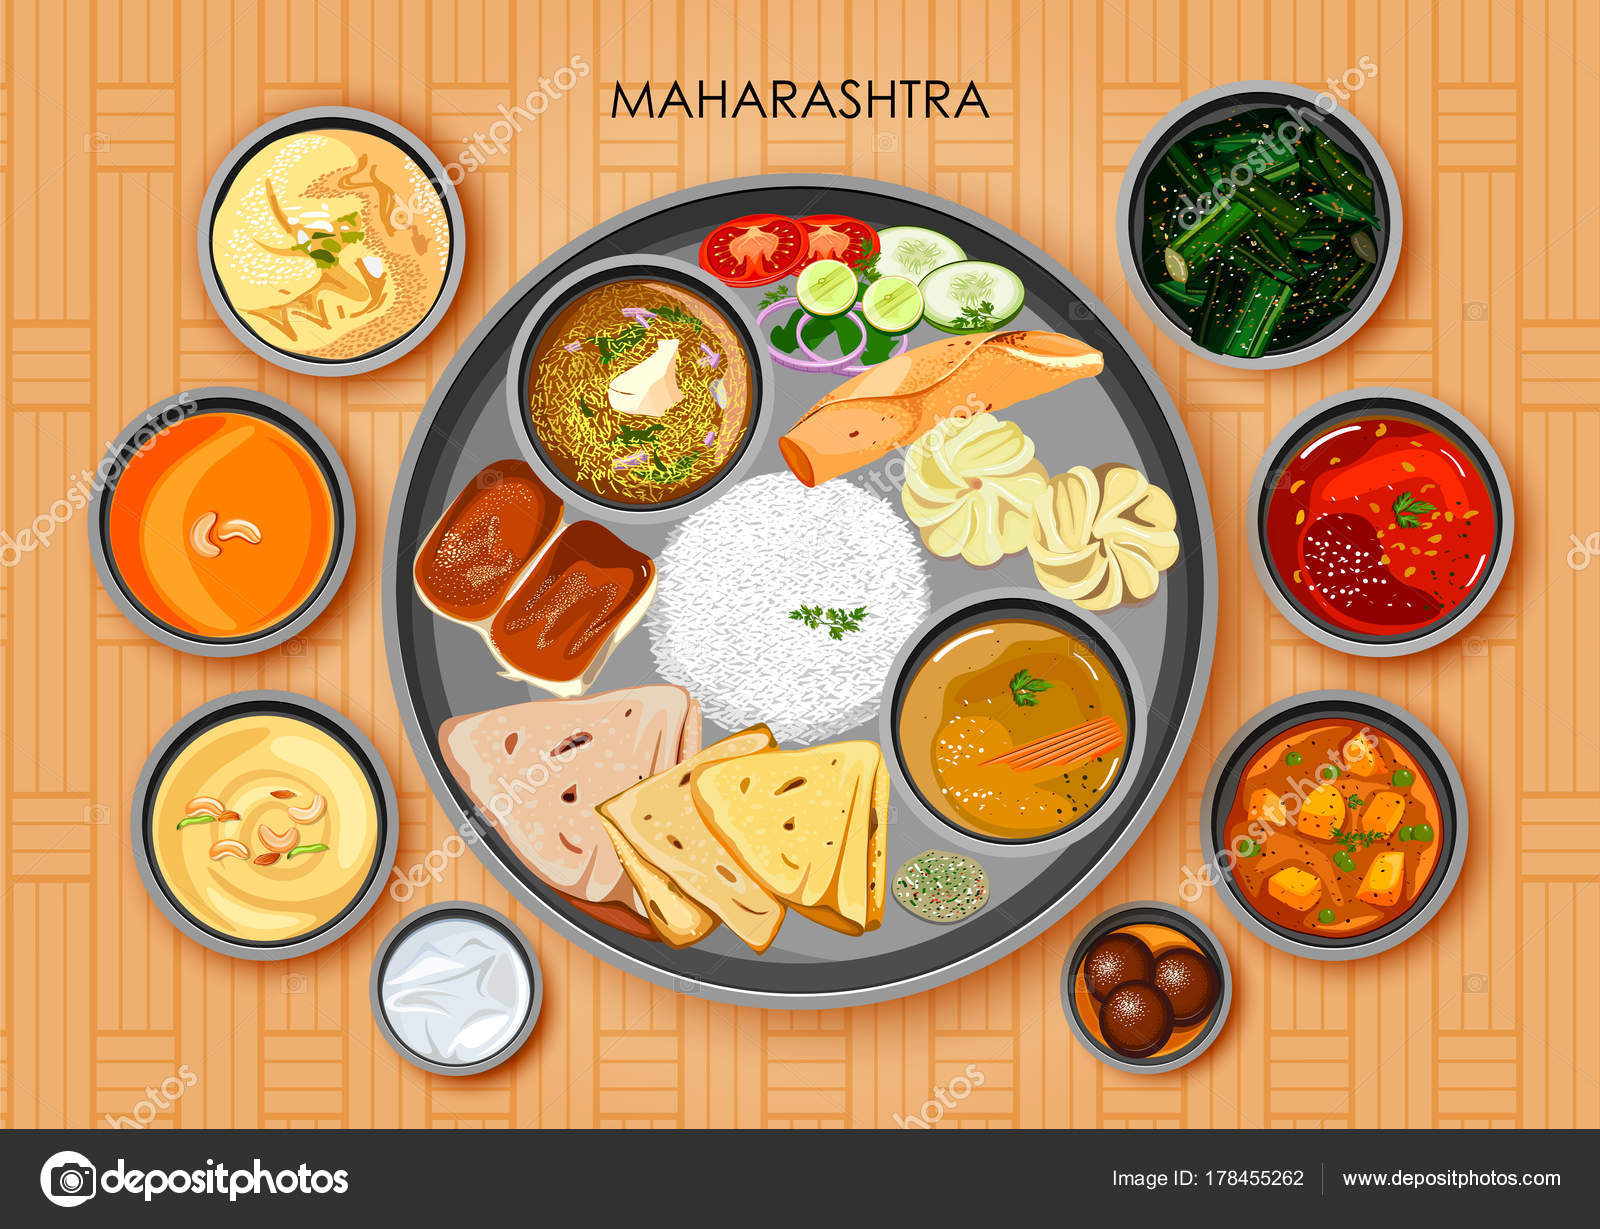 Cuisine Illustration traditional maharashtrian cuisine and food meal thali of maharashtra